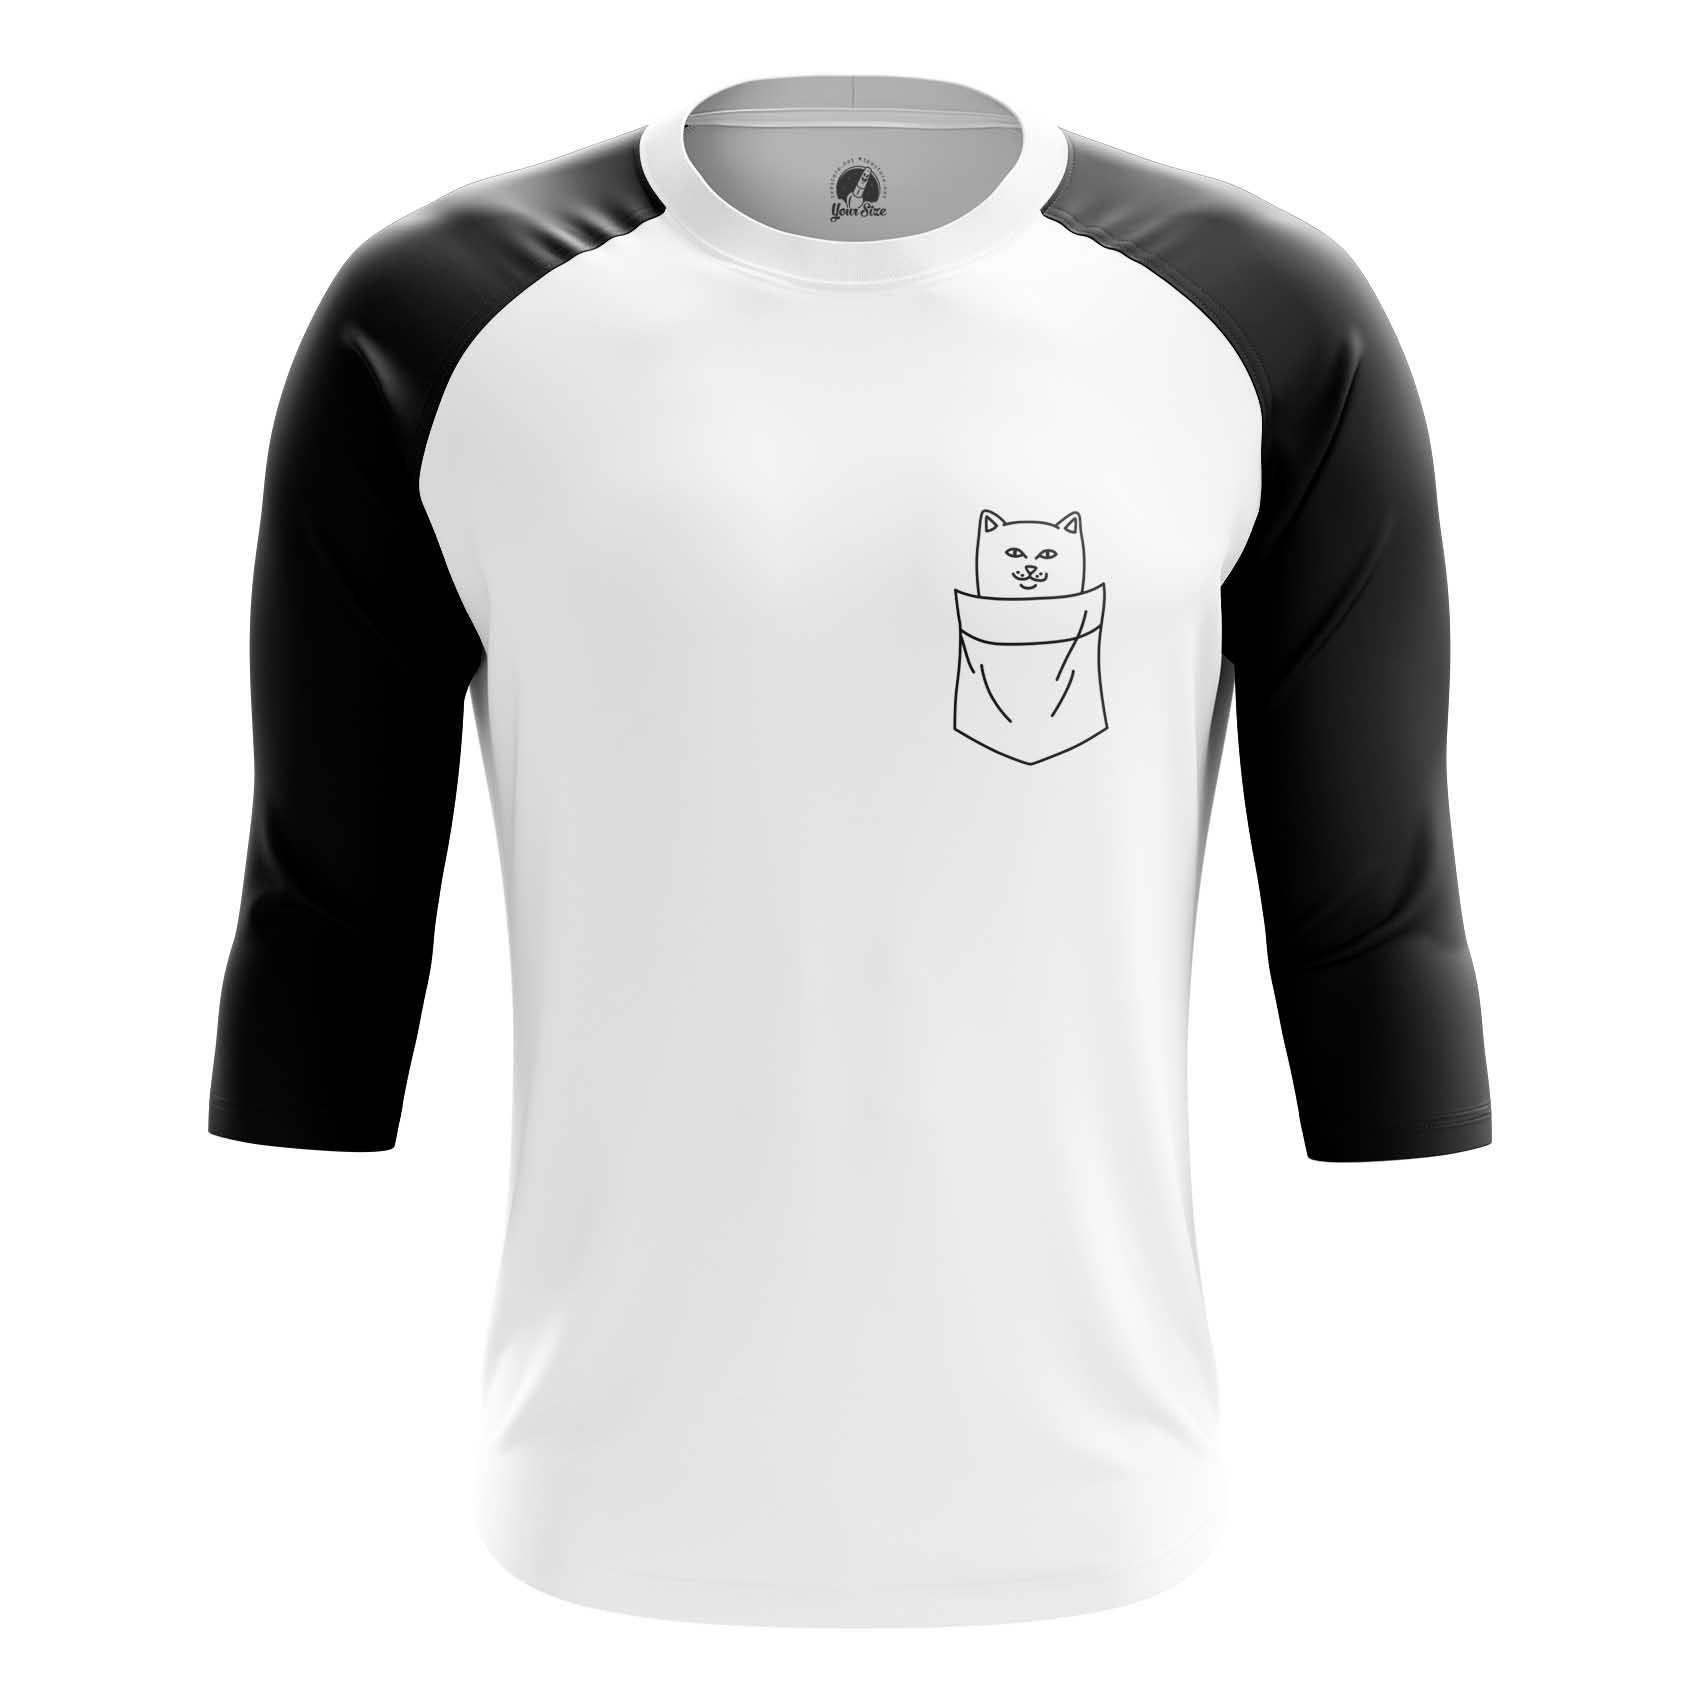 Merch Men'S T-Shirt Cat In Pocket Kitty Clothing